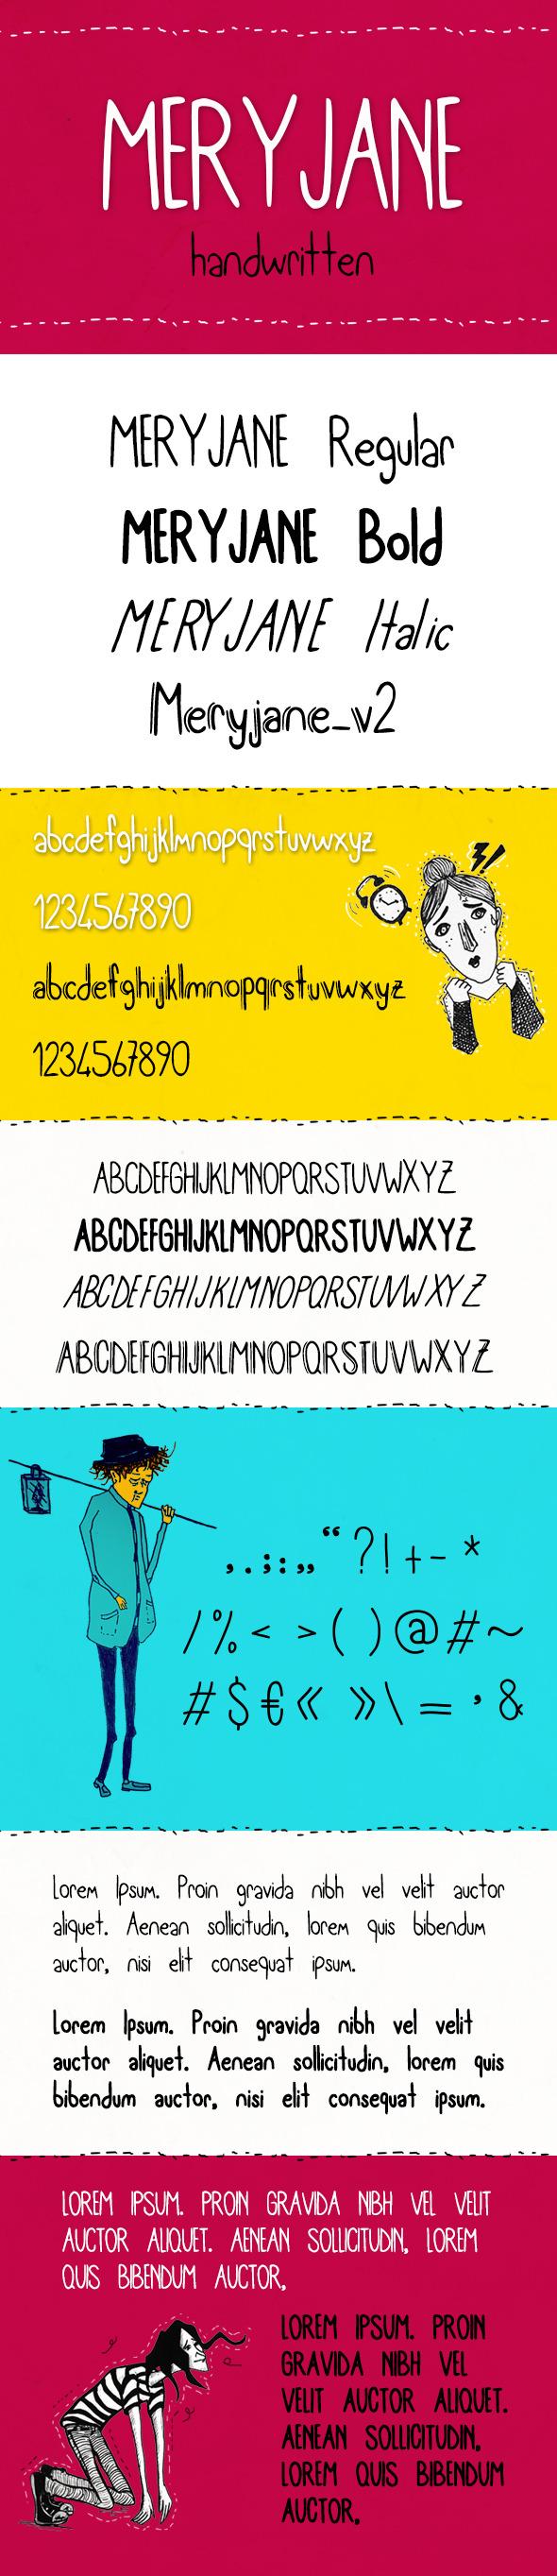 GraphicRiver Meryjane Handwritten Typeface 10268038